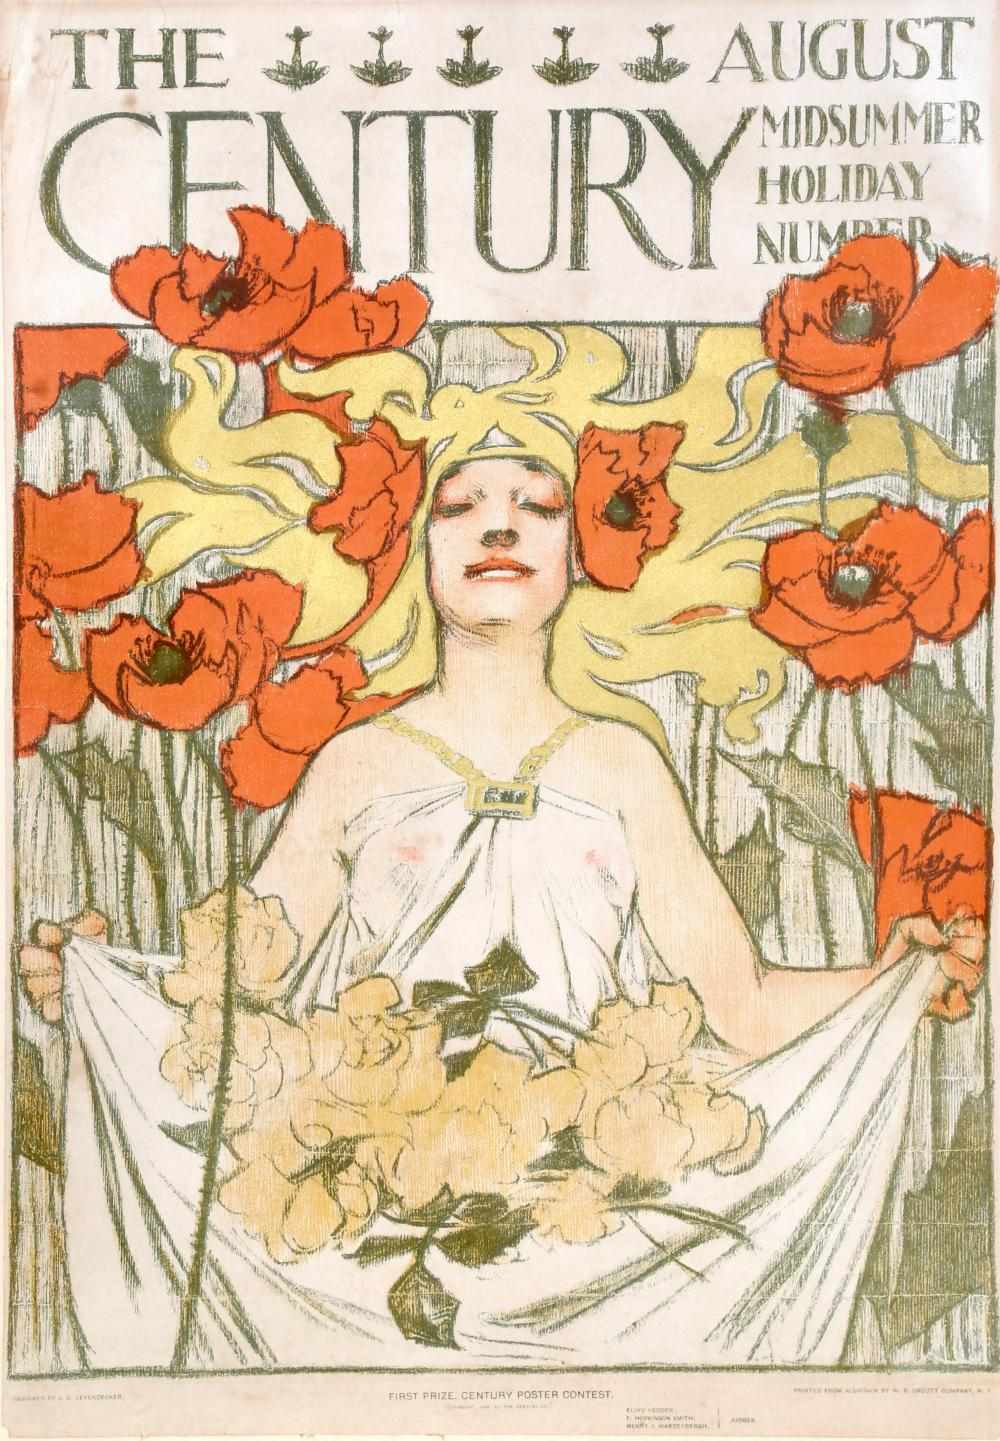 Joseph Christian Leyendecker, The Century - Midsummer Holiday Number, August, Poster